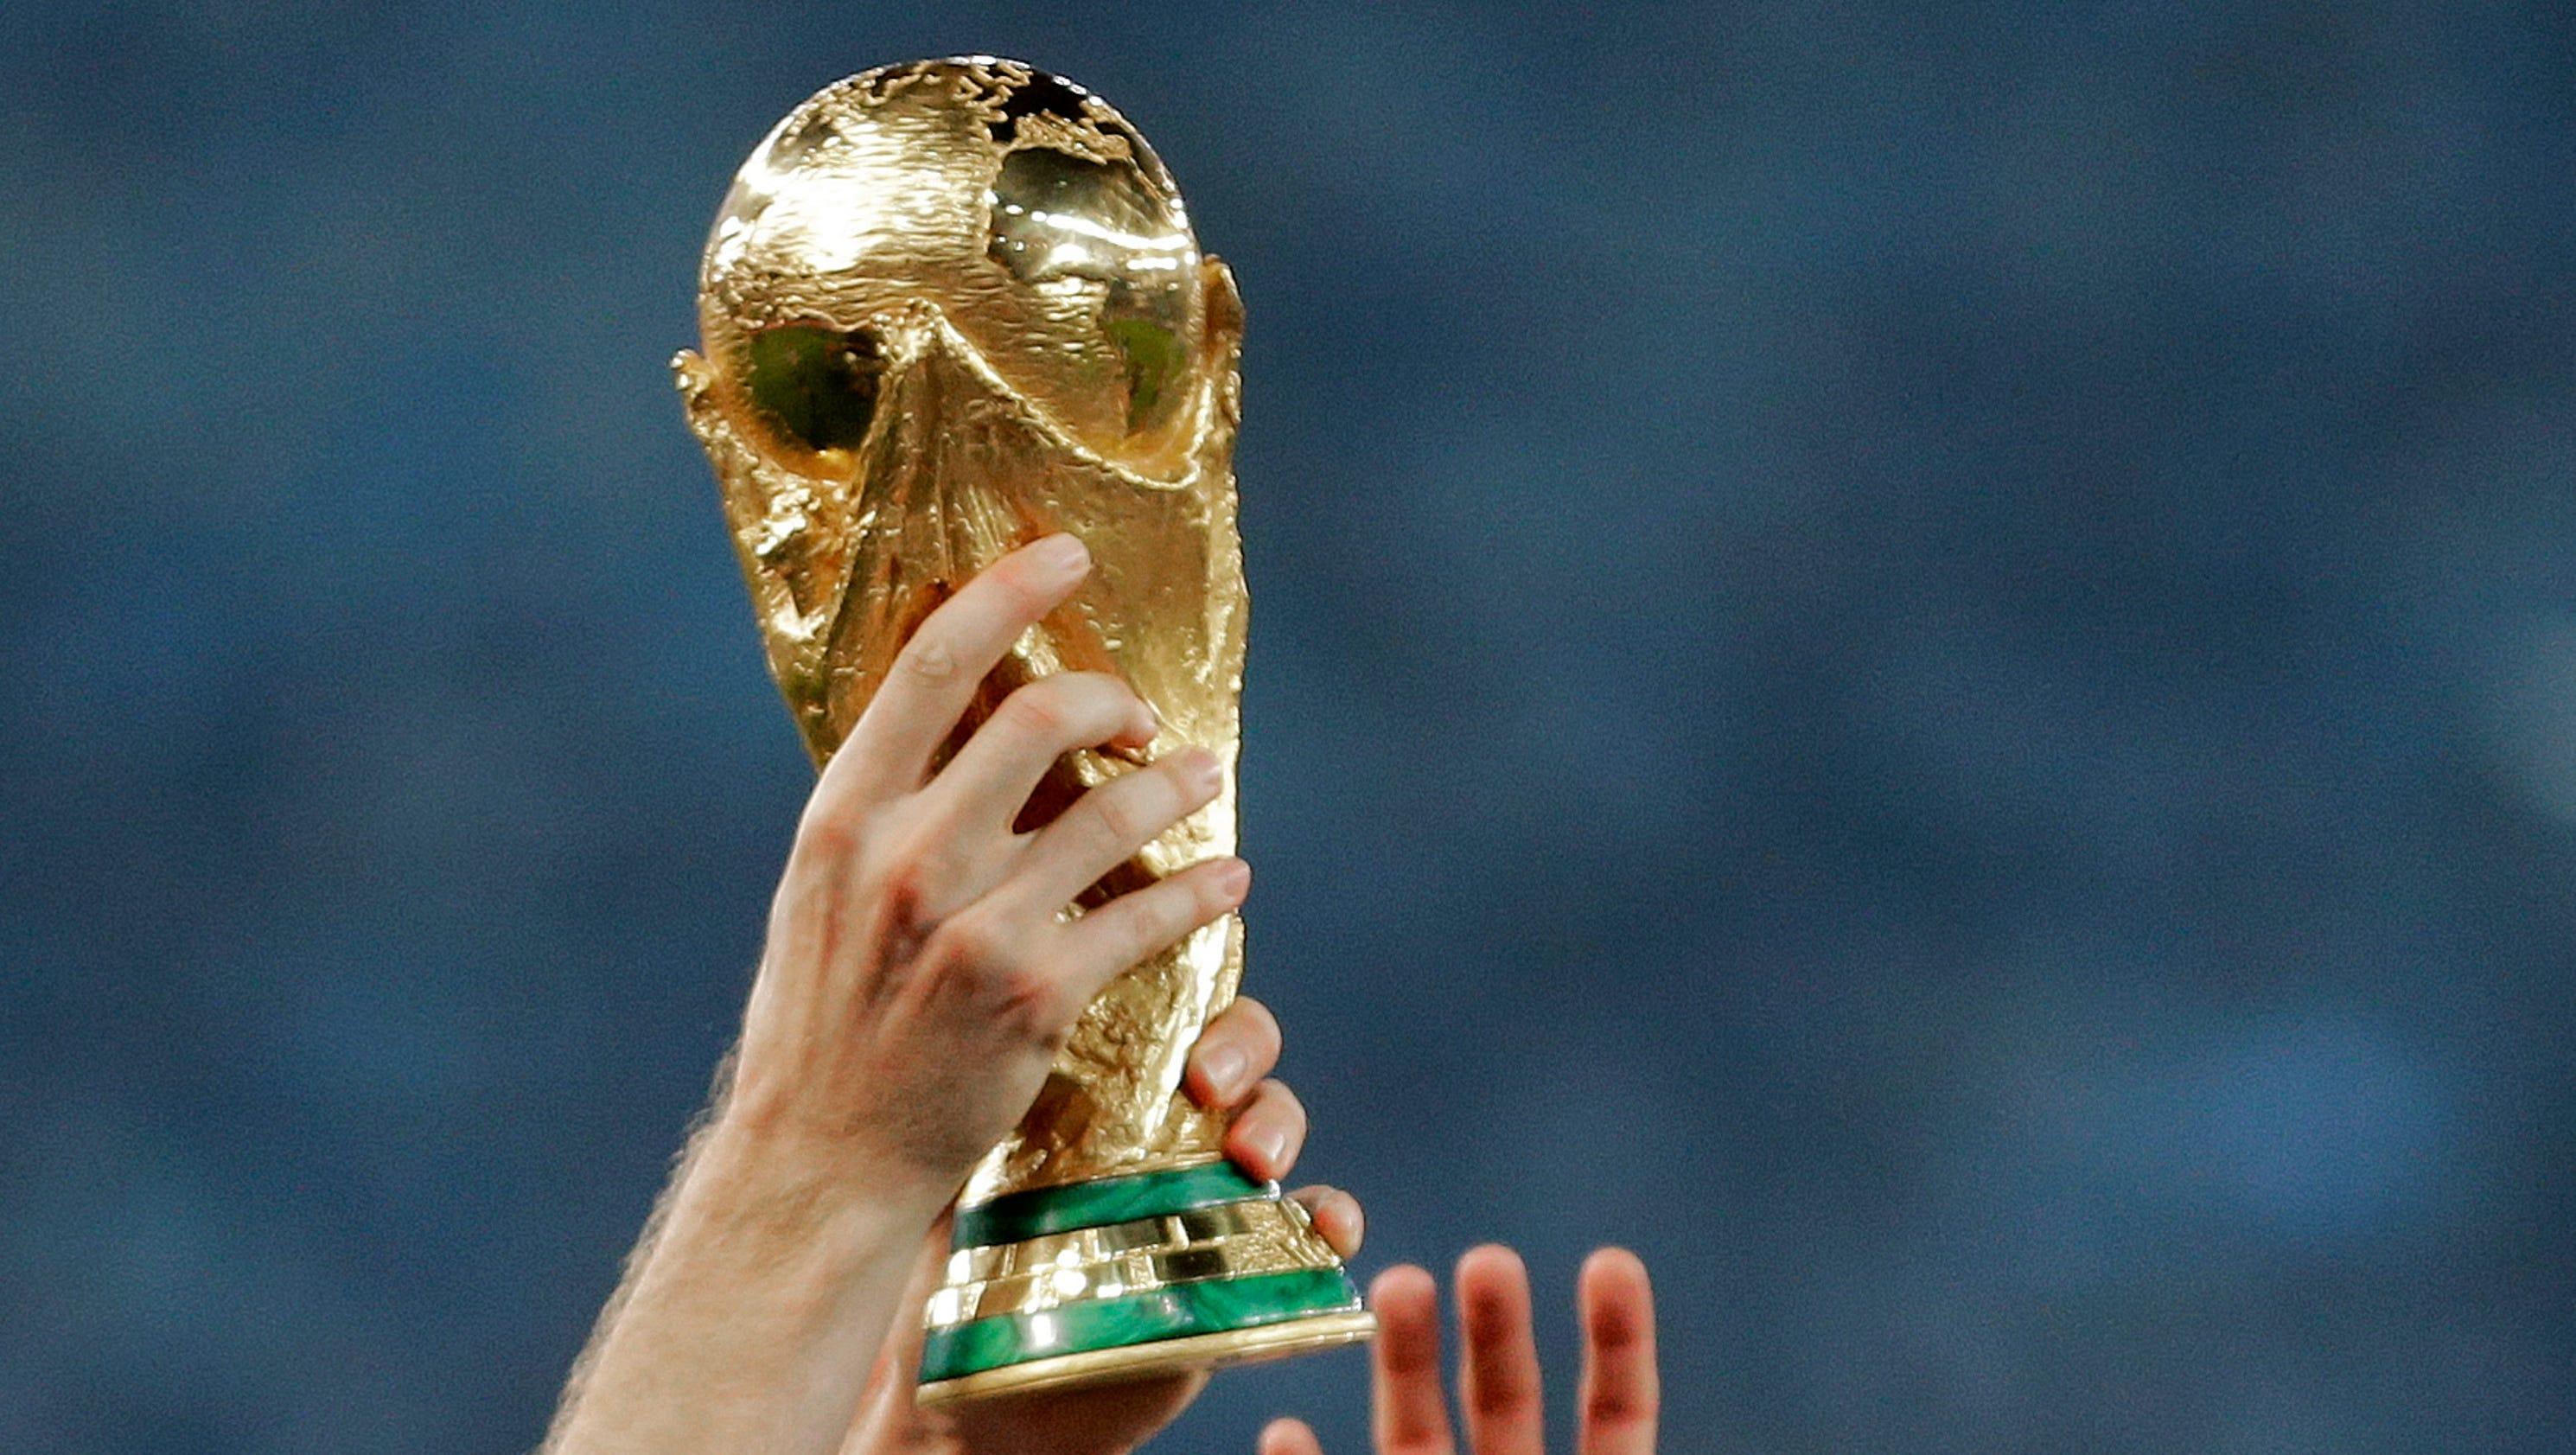 636570760174867518-ap-obit-wcup-trophy-designer-86387470